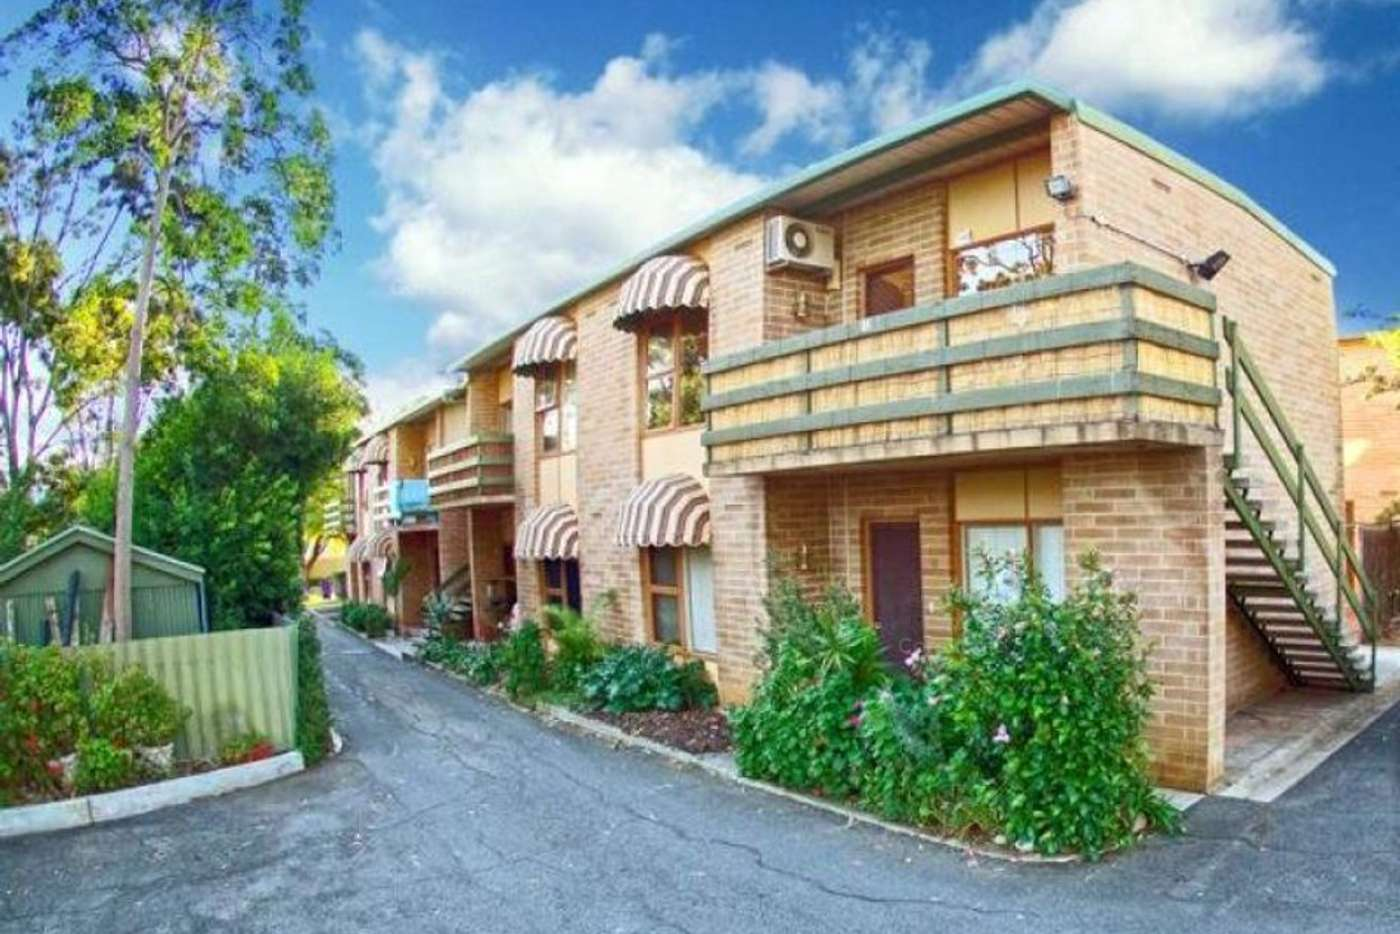 Main view of Homely unit listing, 13/16 L'Estrange Street, Glenside SA 5065